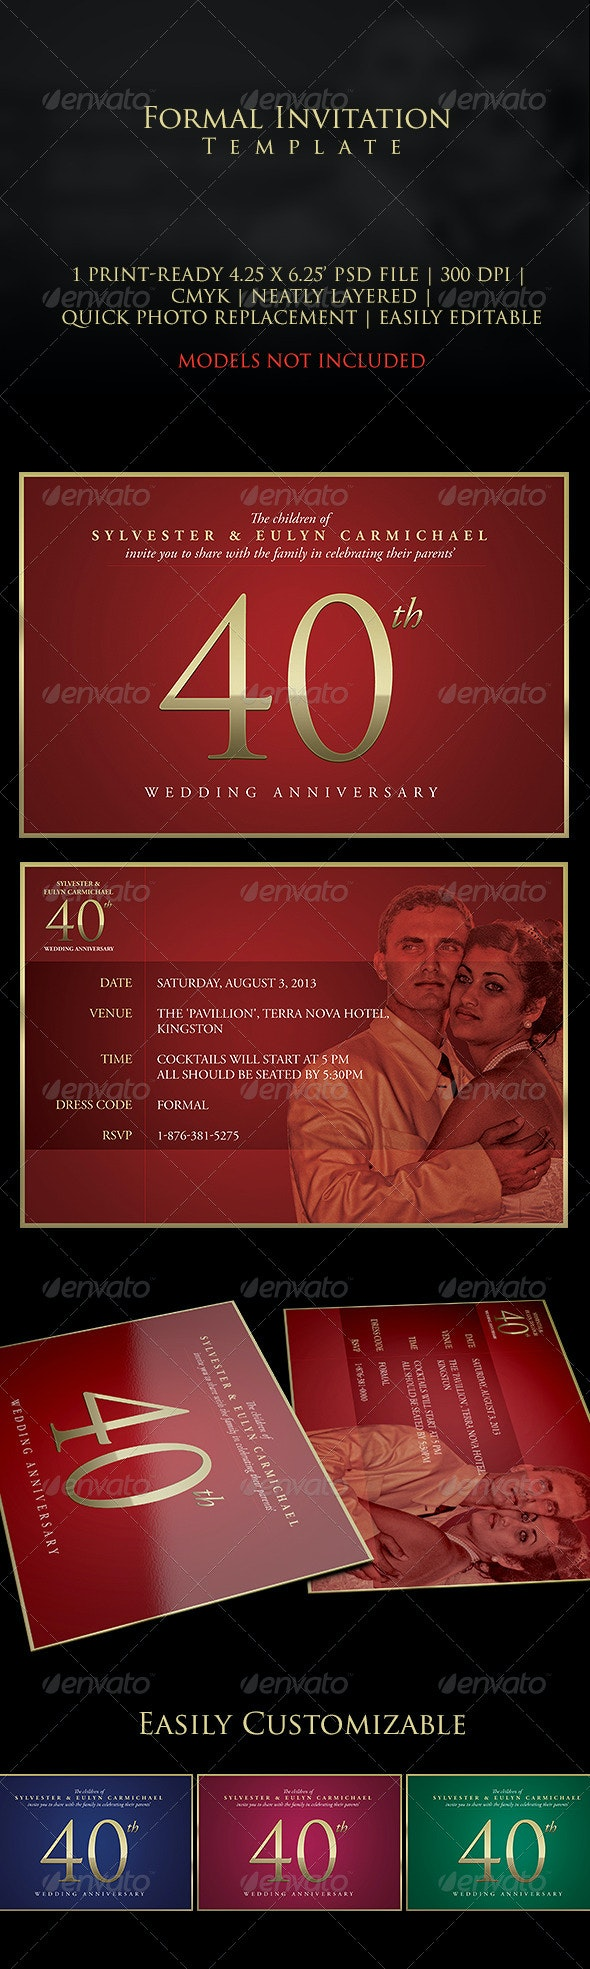 Formal Anniversary Invitation - Invitations Cards & Invites